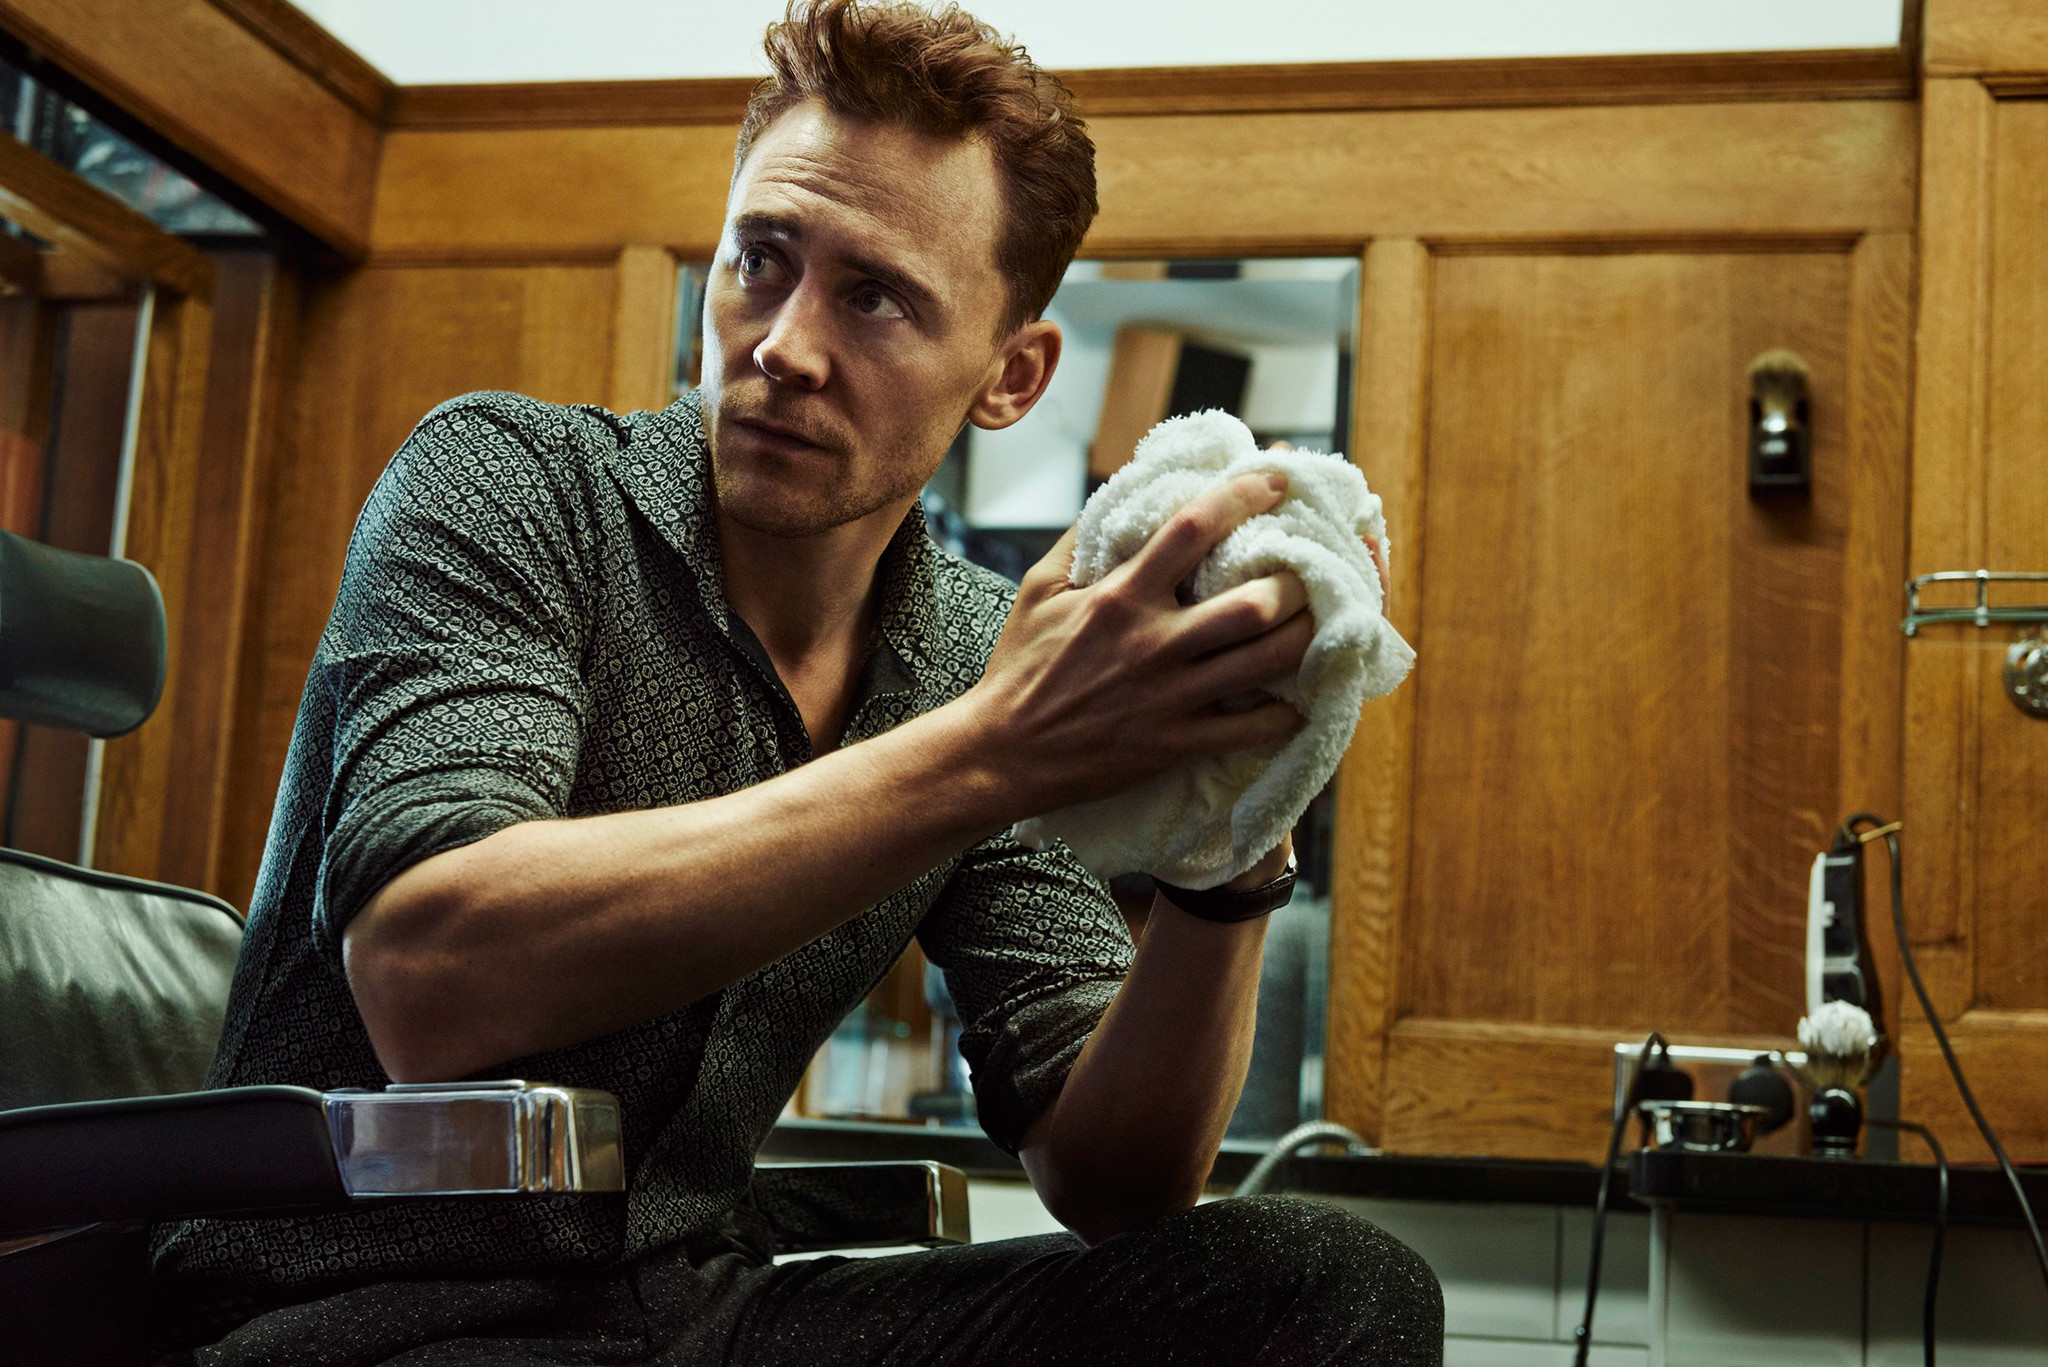 tom hiddleston actor towel